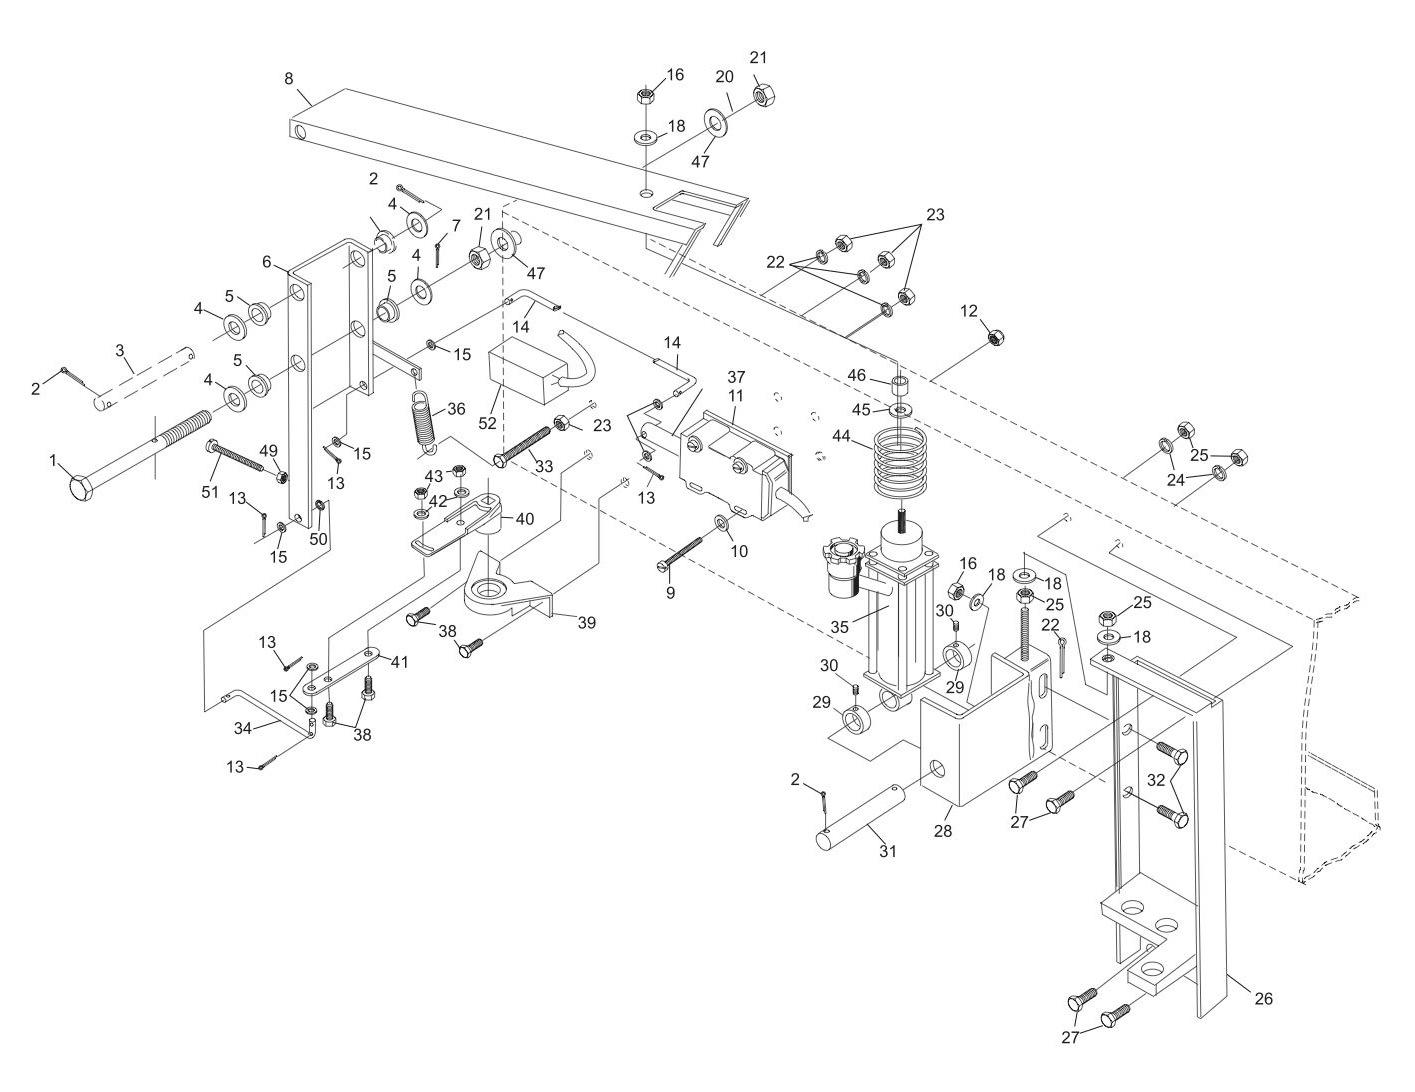 Stroke Limiter Assembly - Horizontal Solenoid